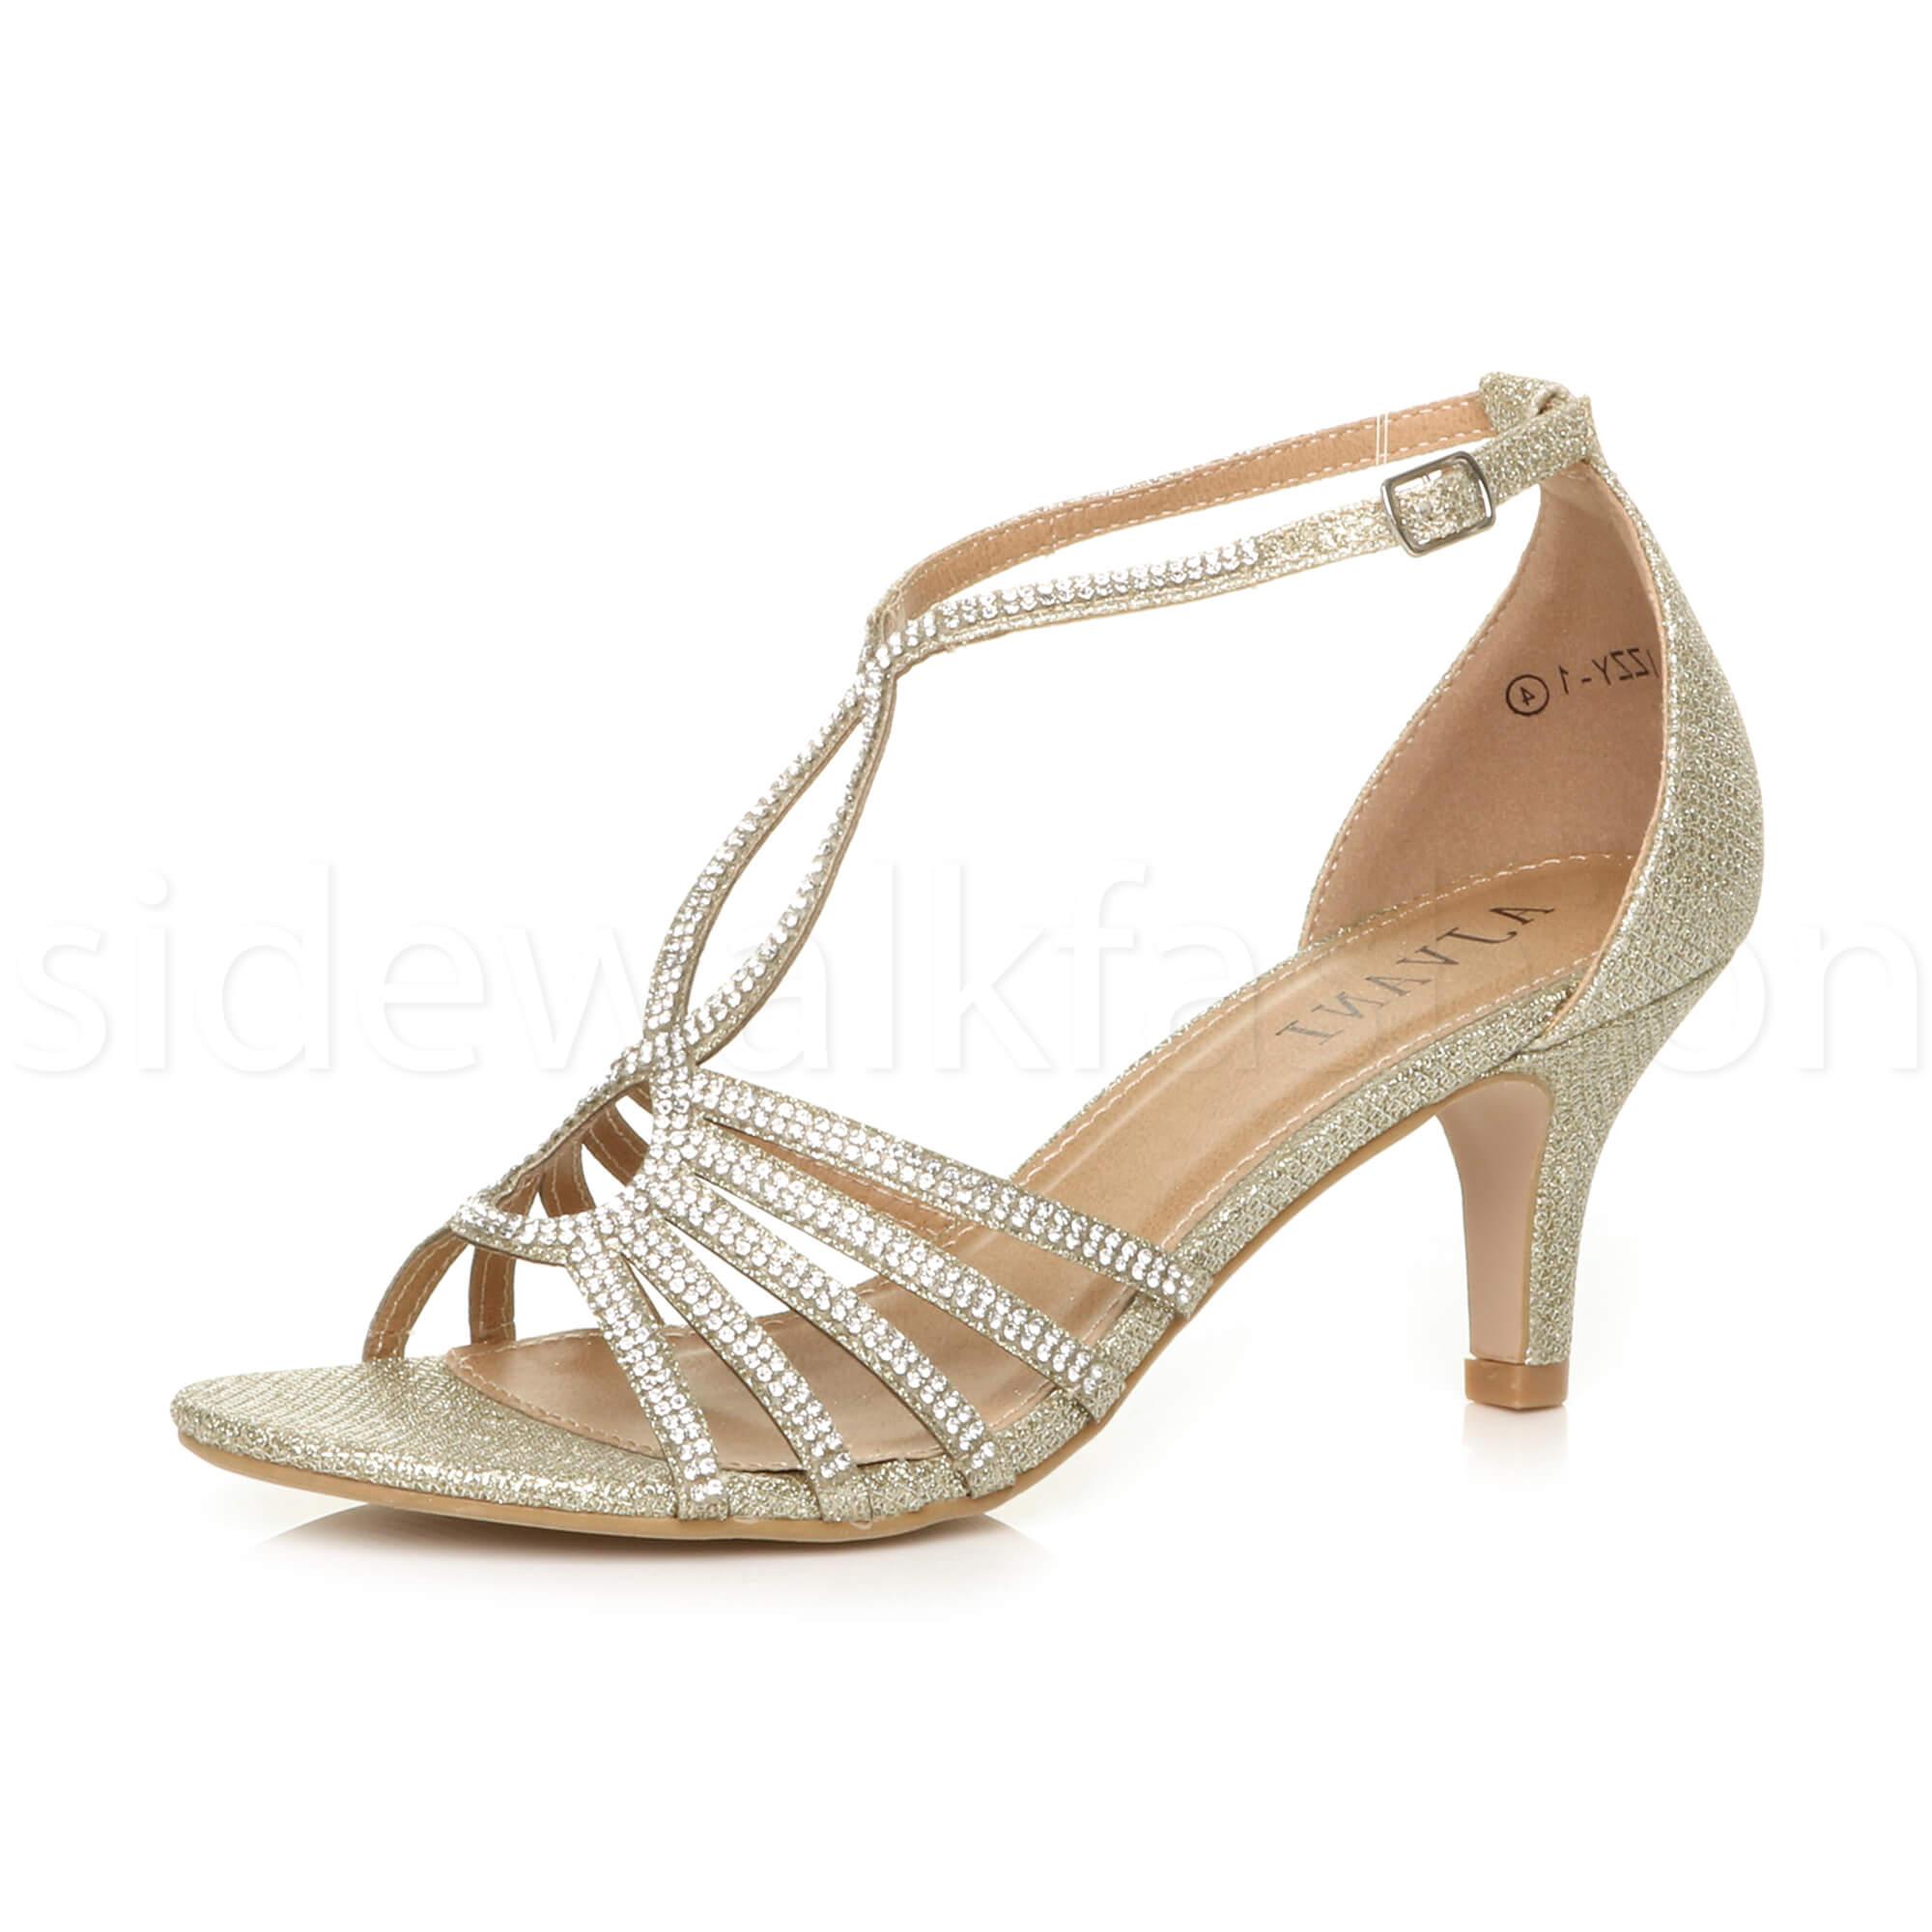 Womens-ladies-medium-heel-wedding-bridal-t-bar-strappy-sandals-prom-shoes-size